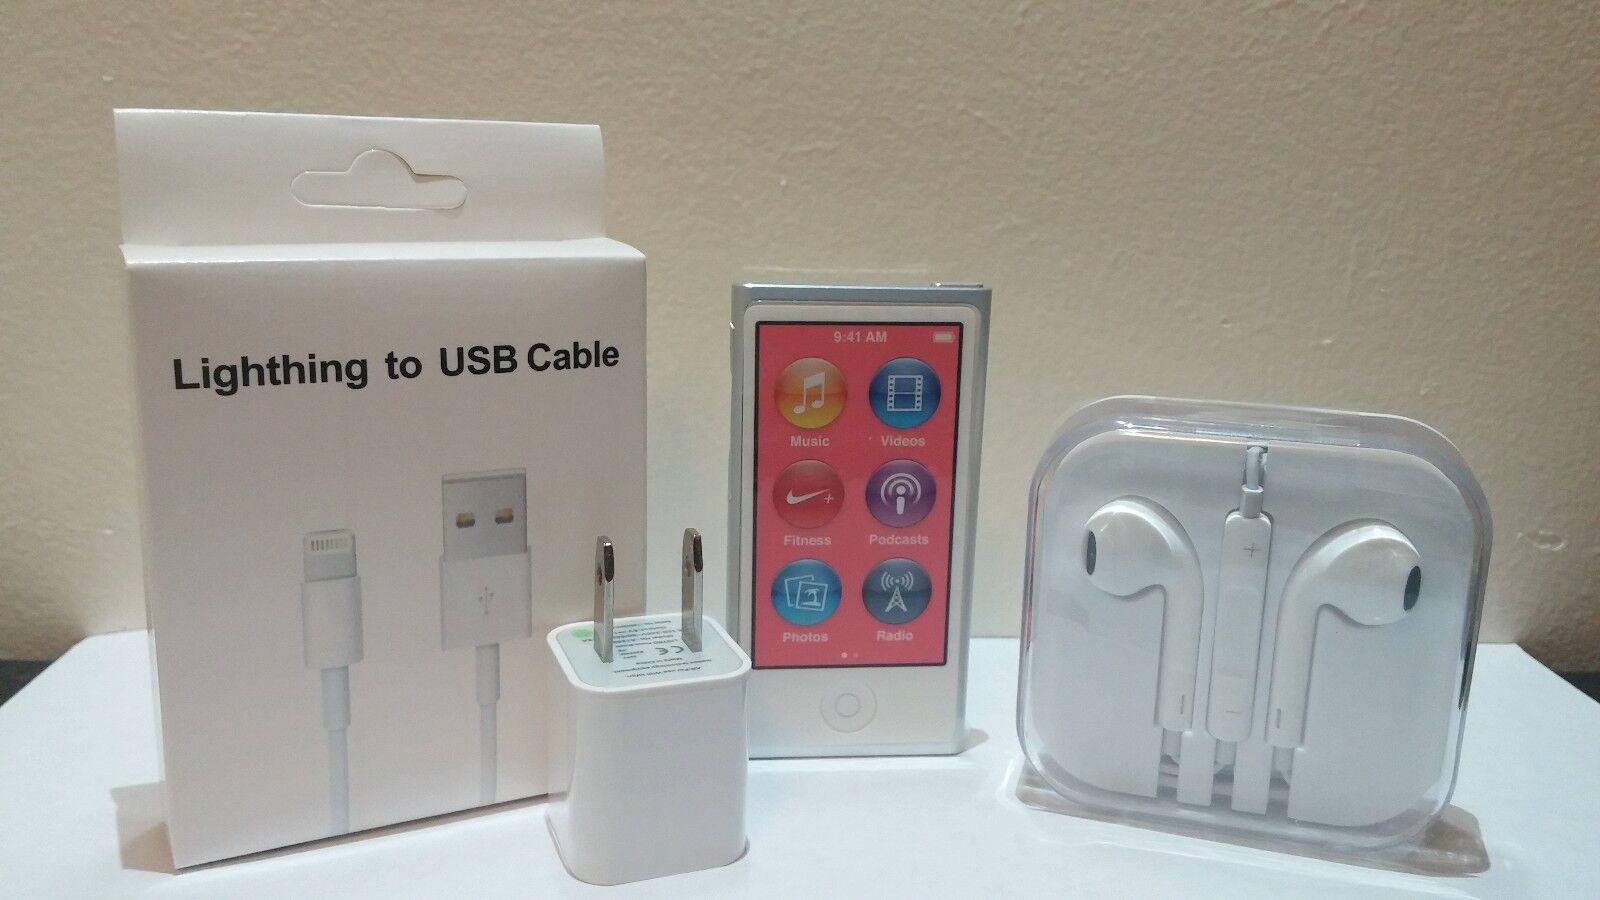 Ipod - Apple iPod nano 7th Generation Silver (16 GB) new